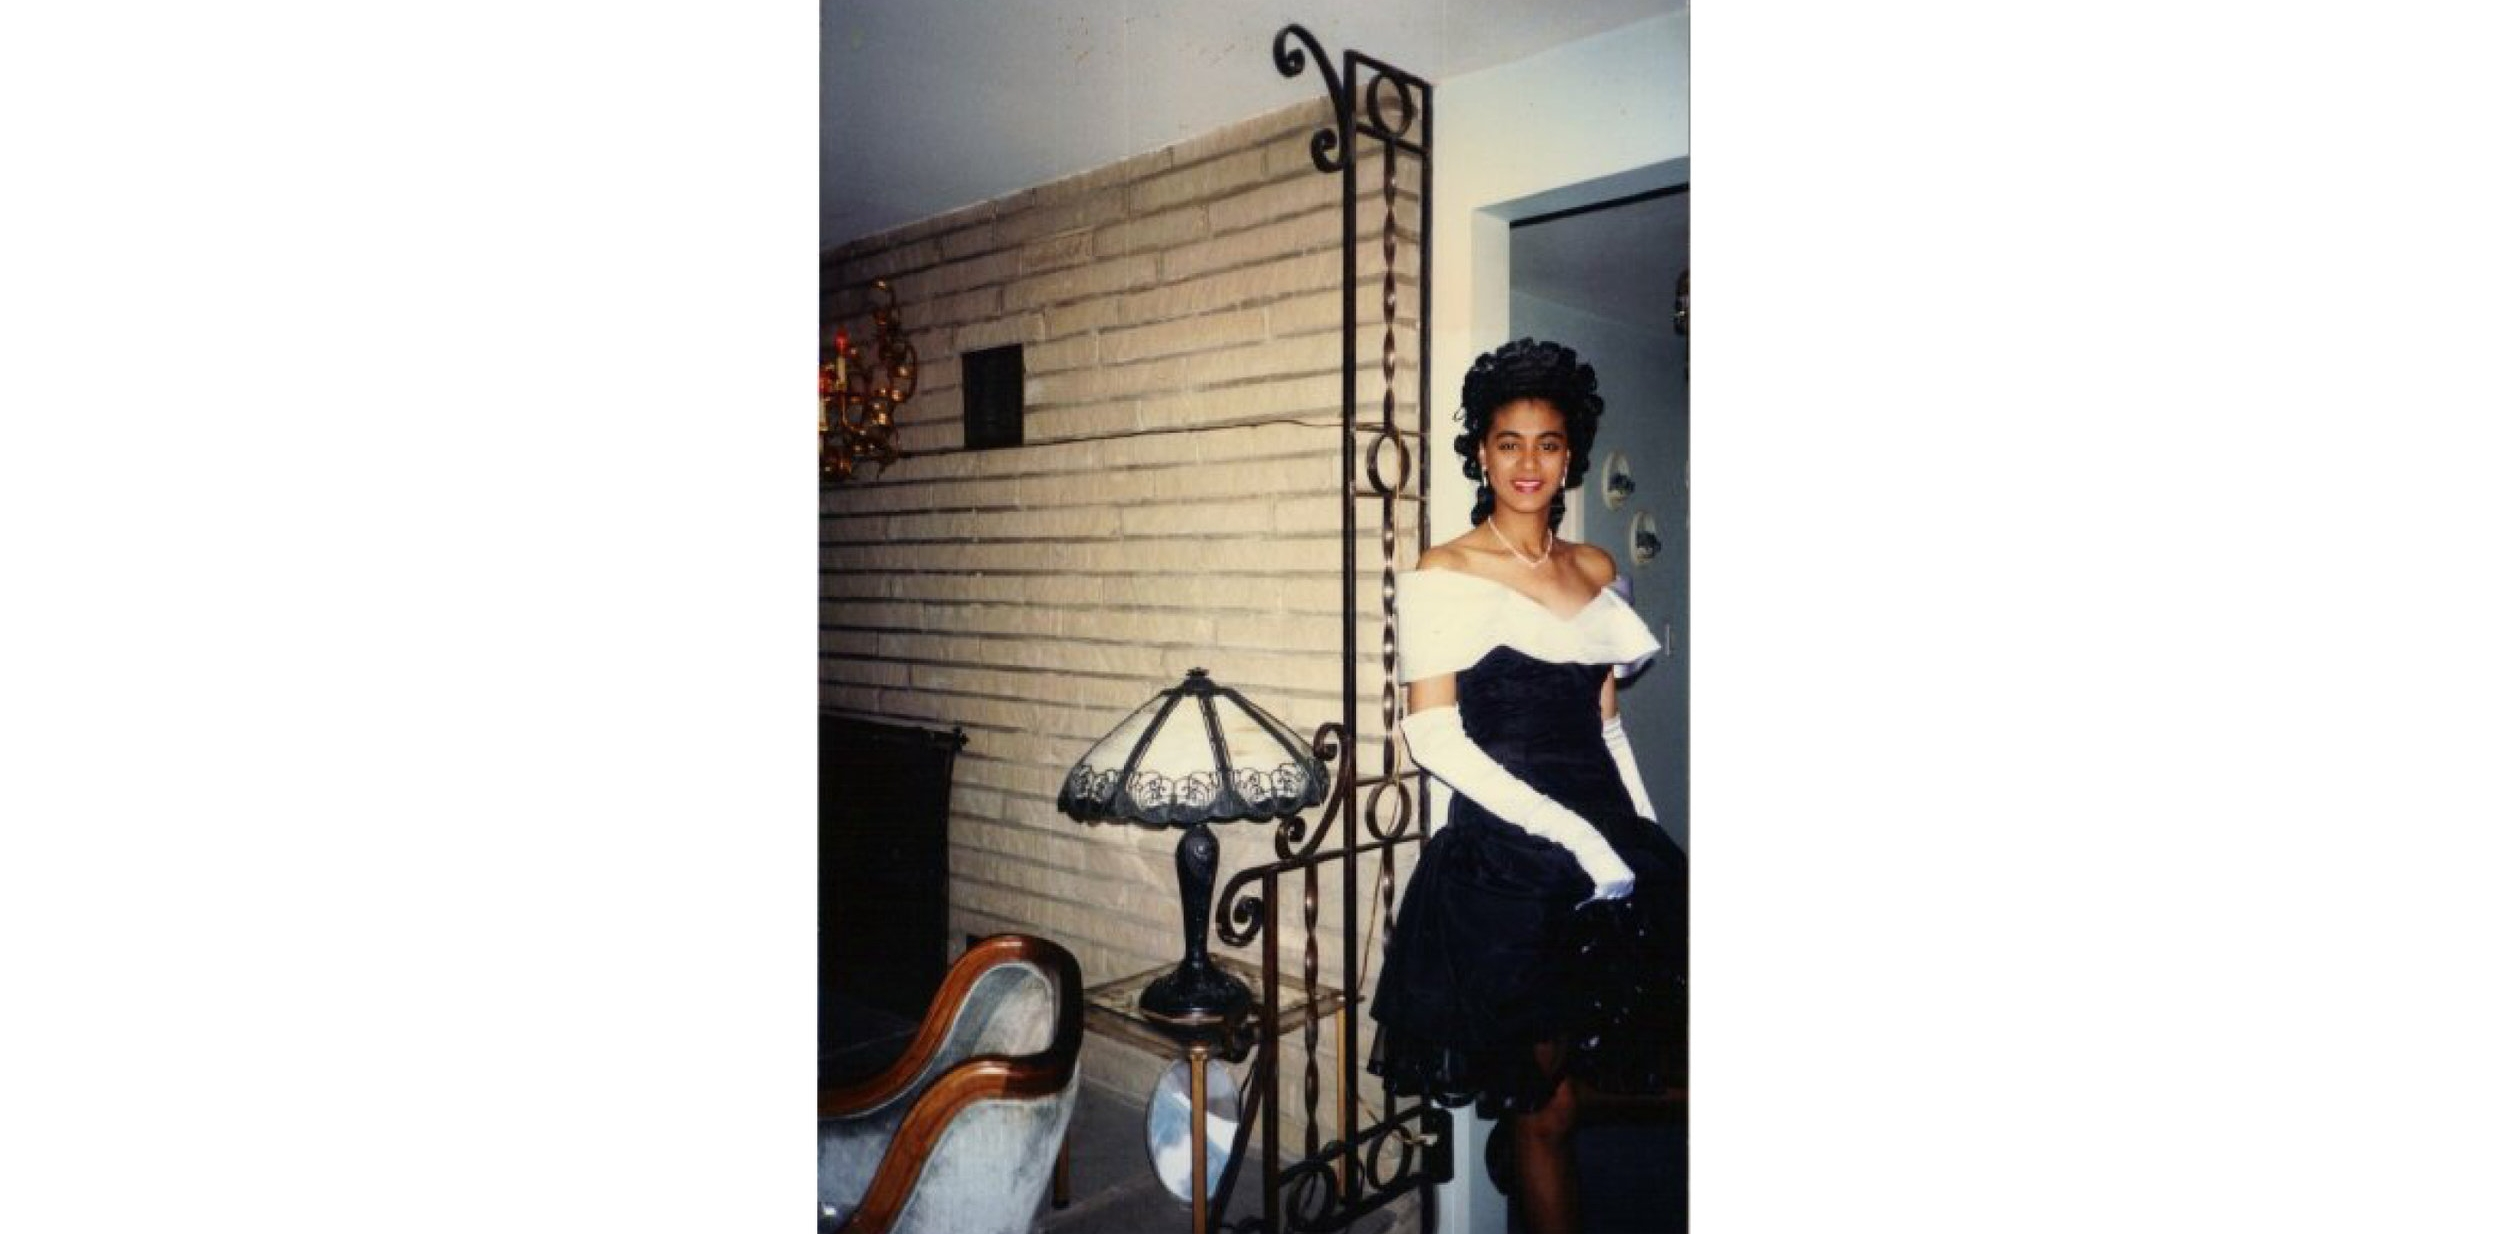 JUNIOR PROM 1991,BENNETT HIGH SCHOOL, BUFFALO NY. Dress made by Mrs. Taggart.